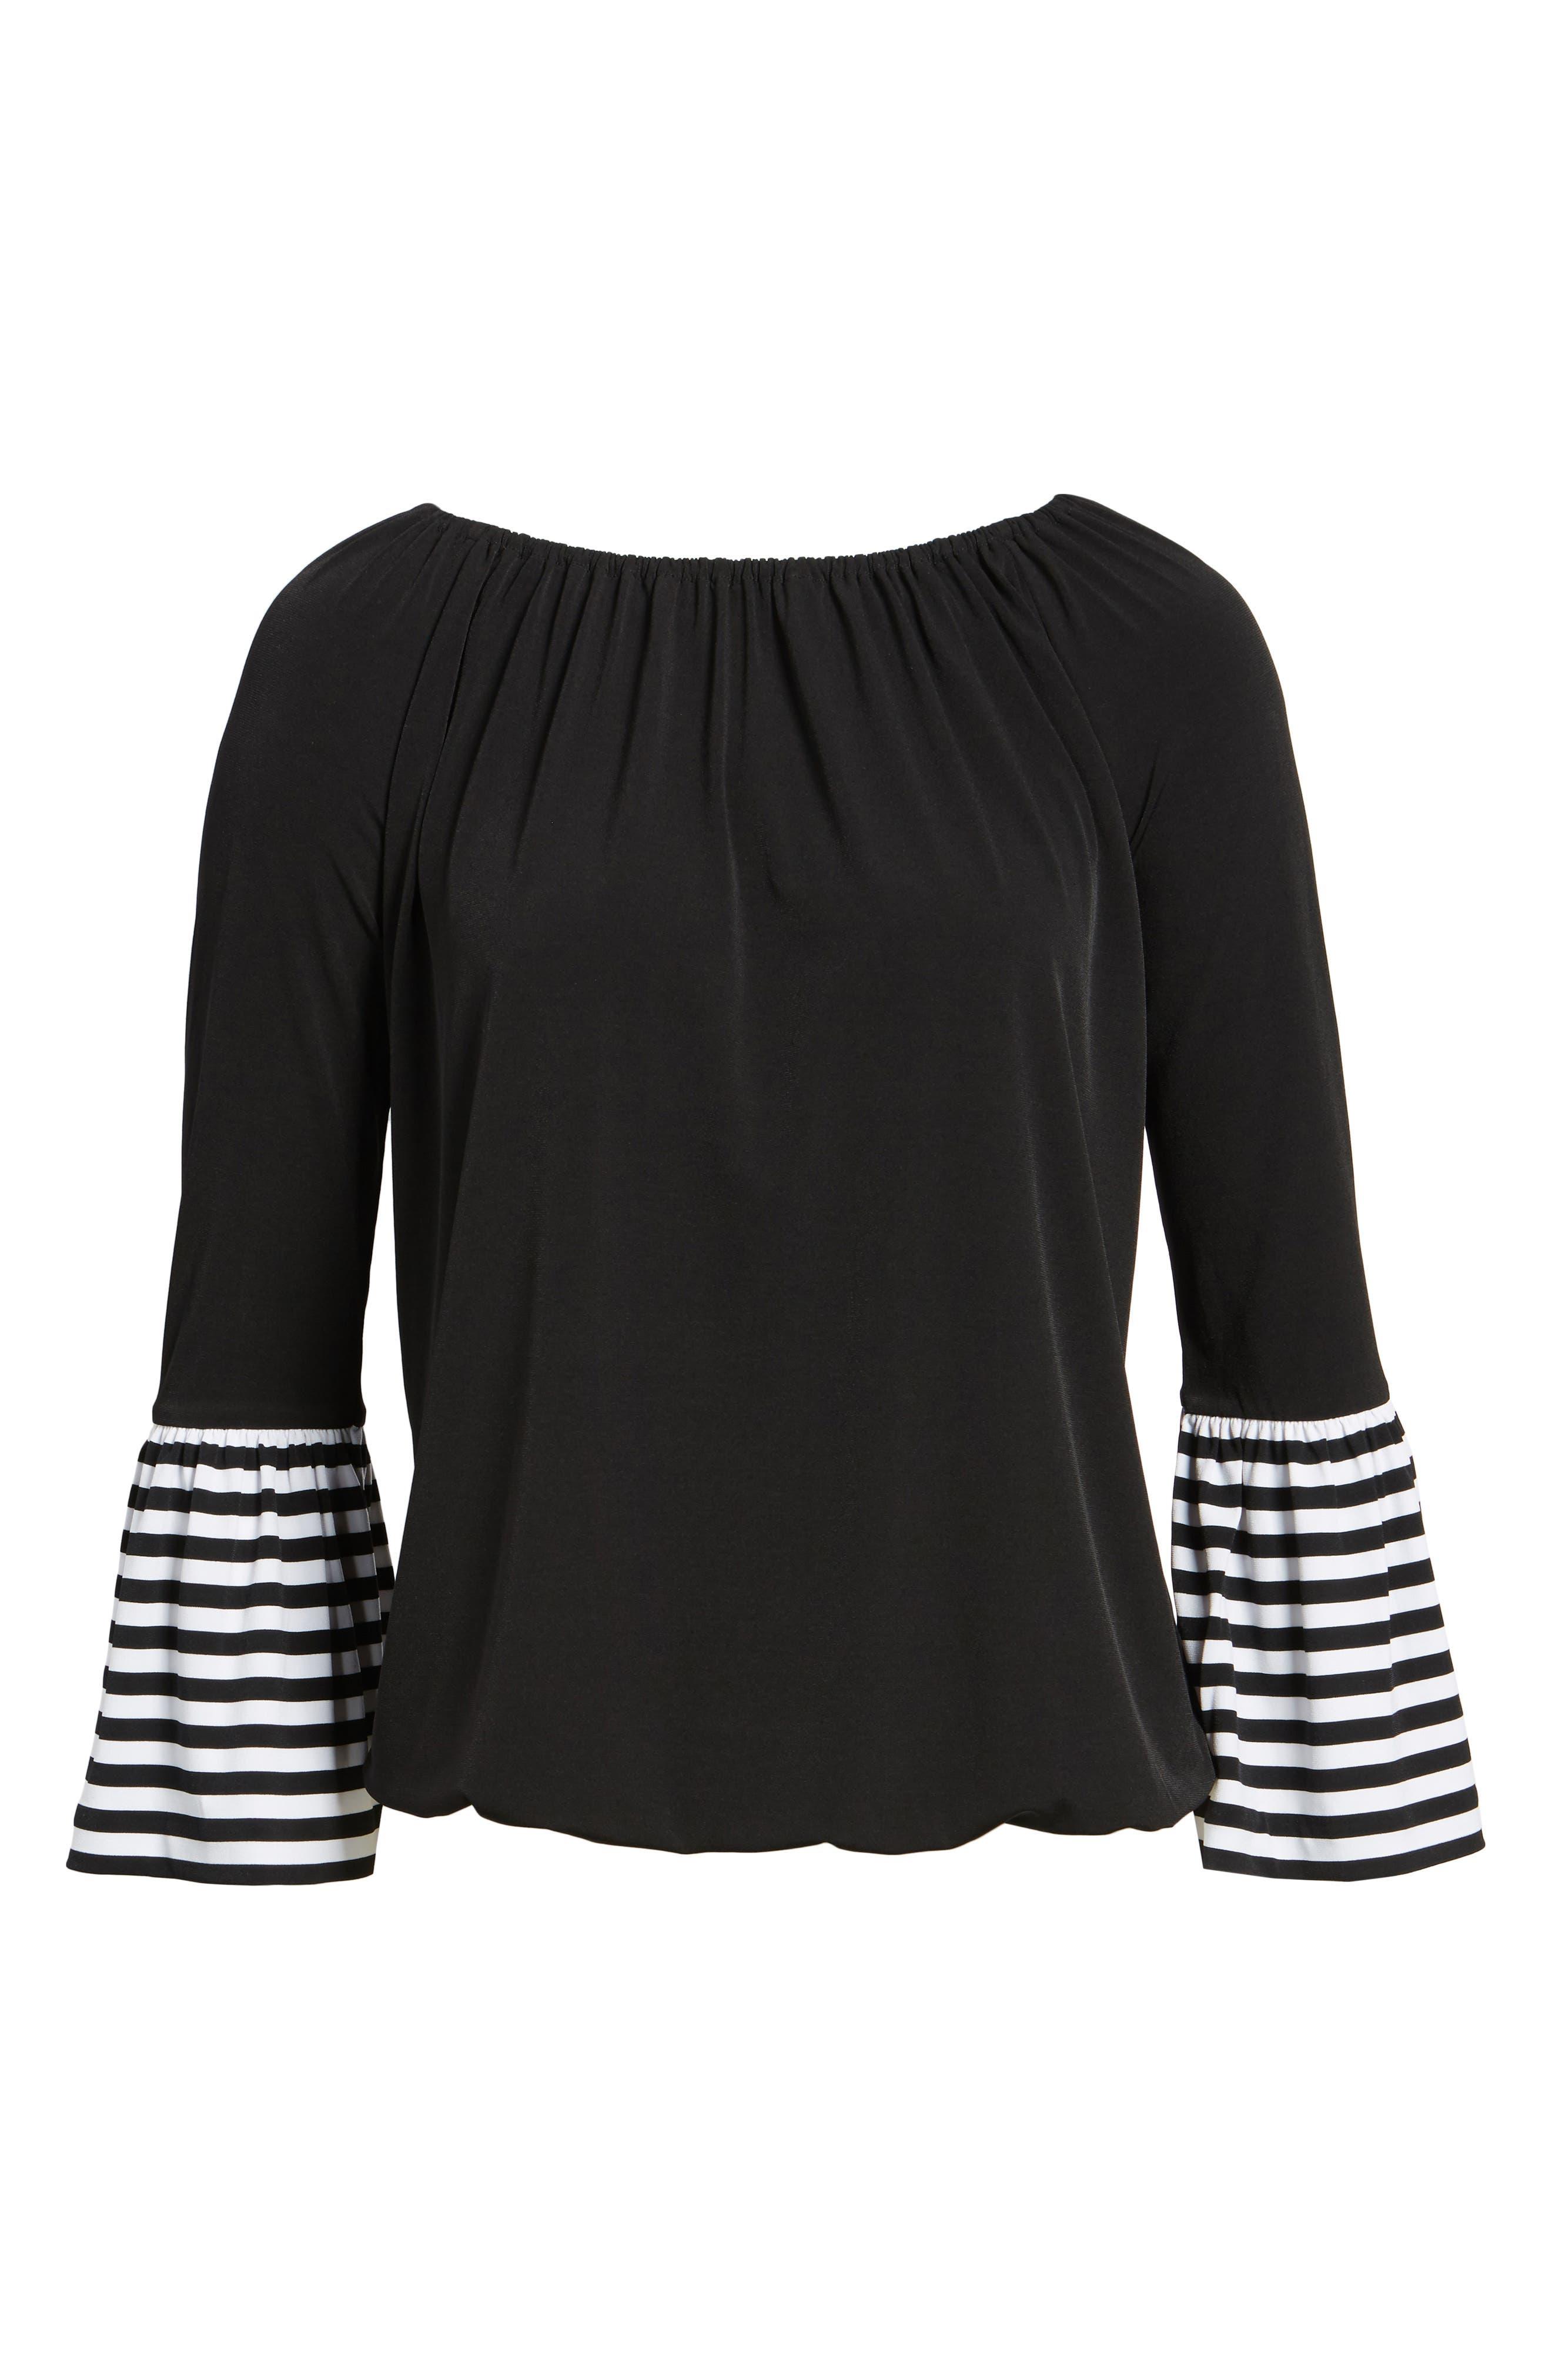 Stripe Cuff Top,                             Alternate thumbnail 6, color,                             Black